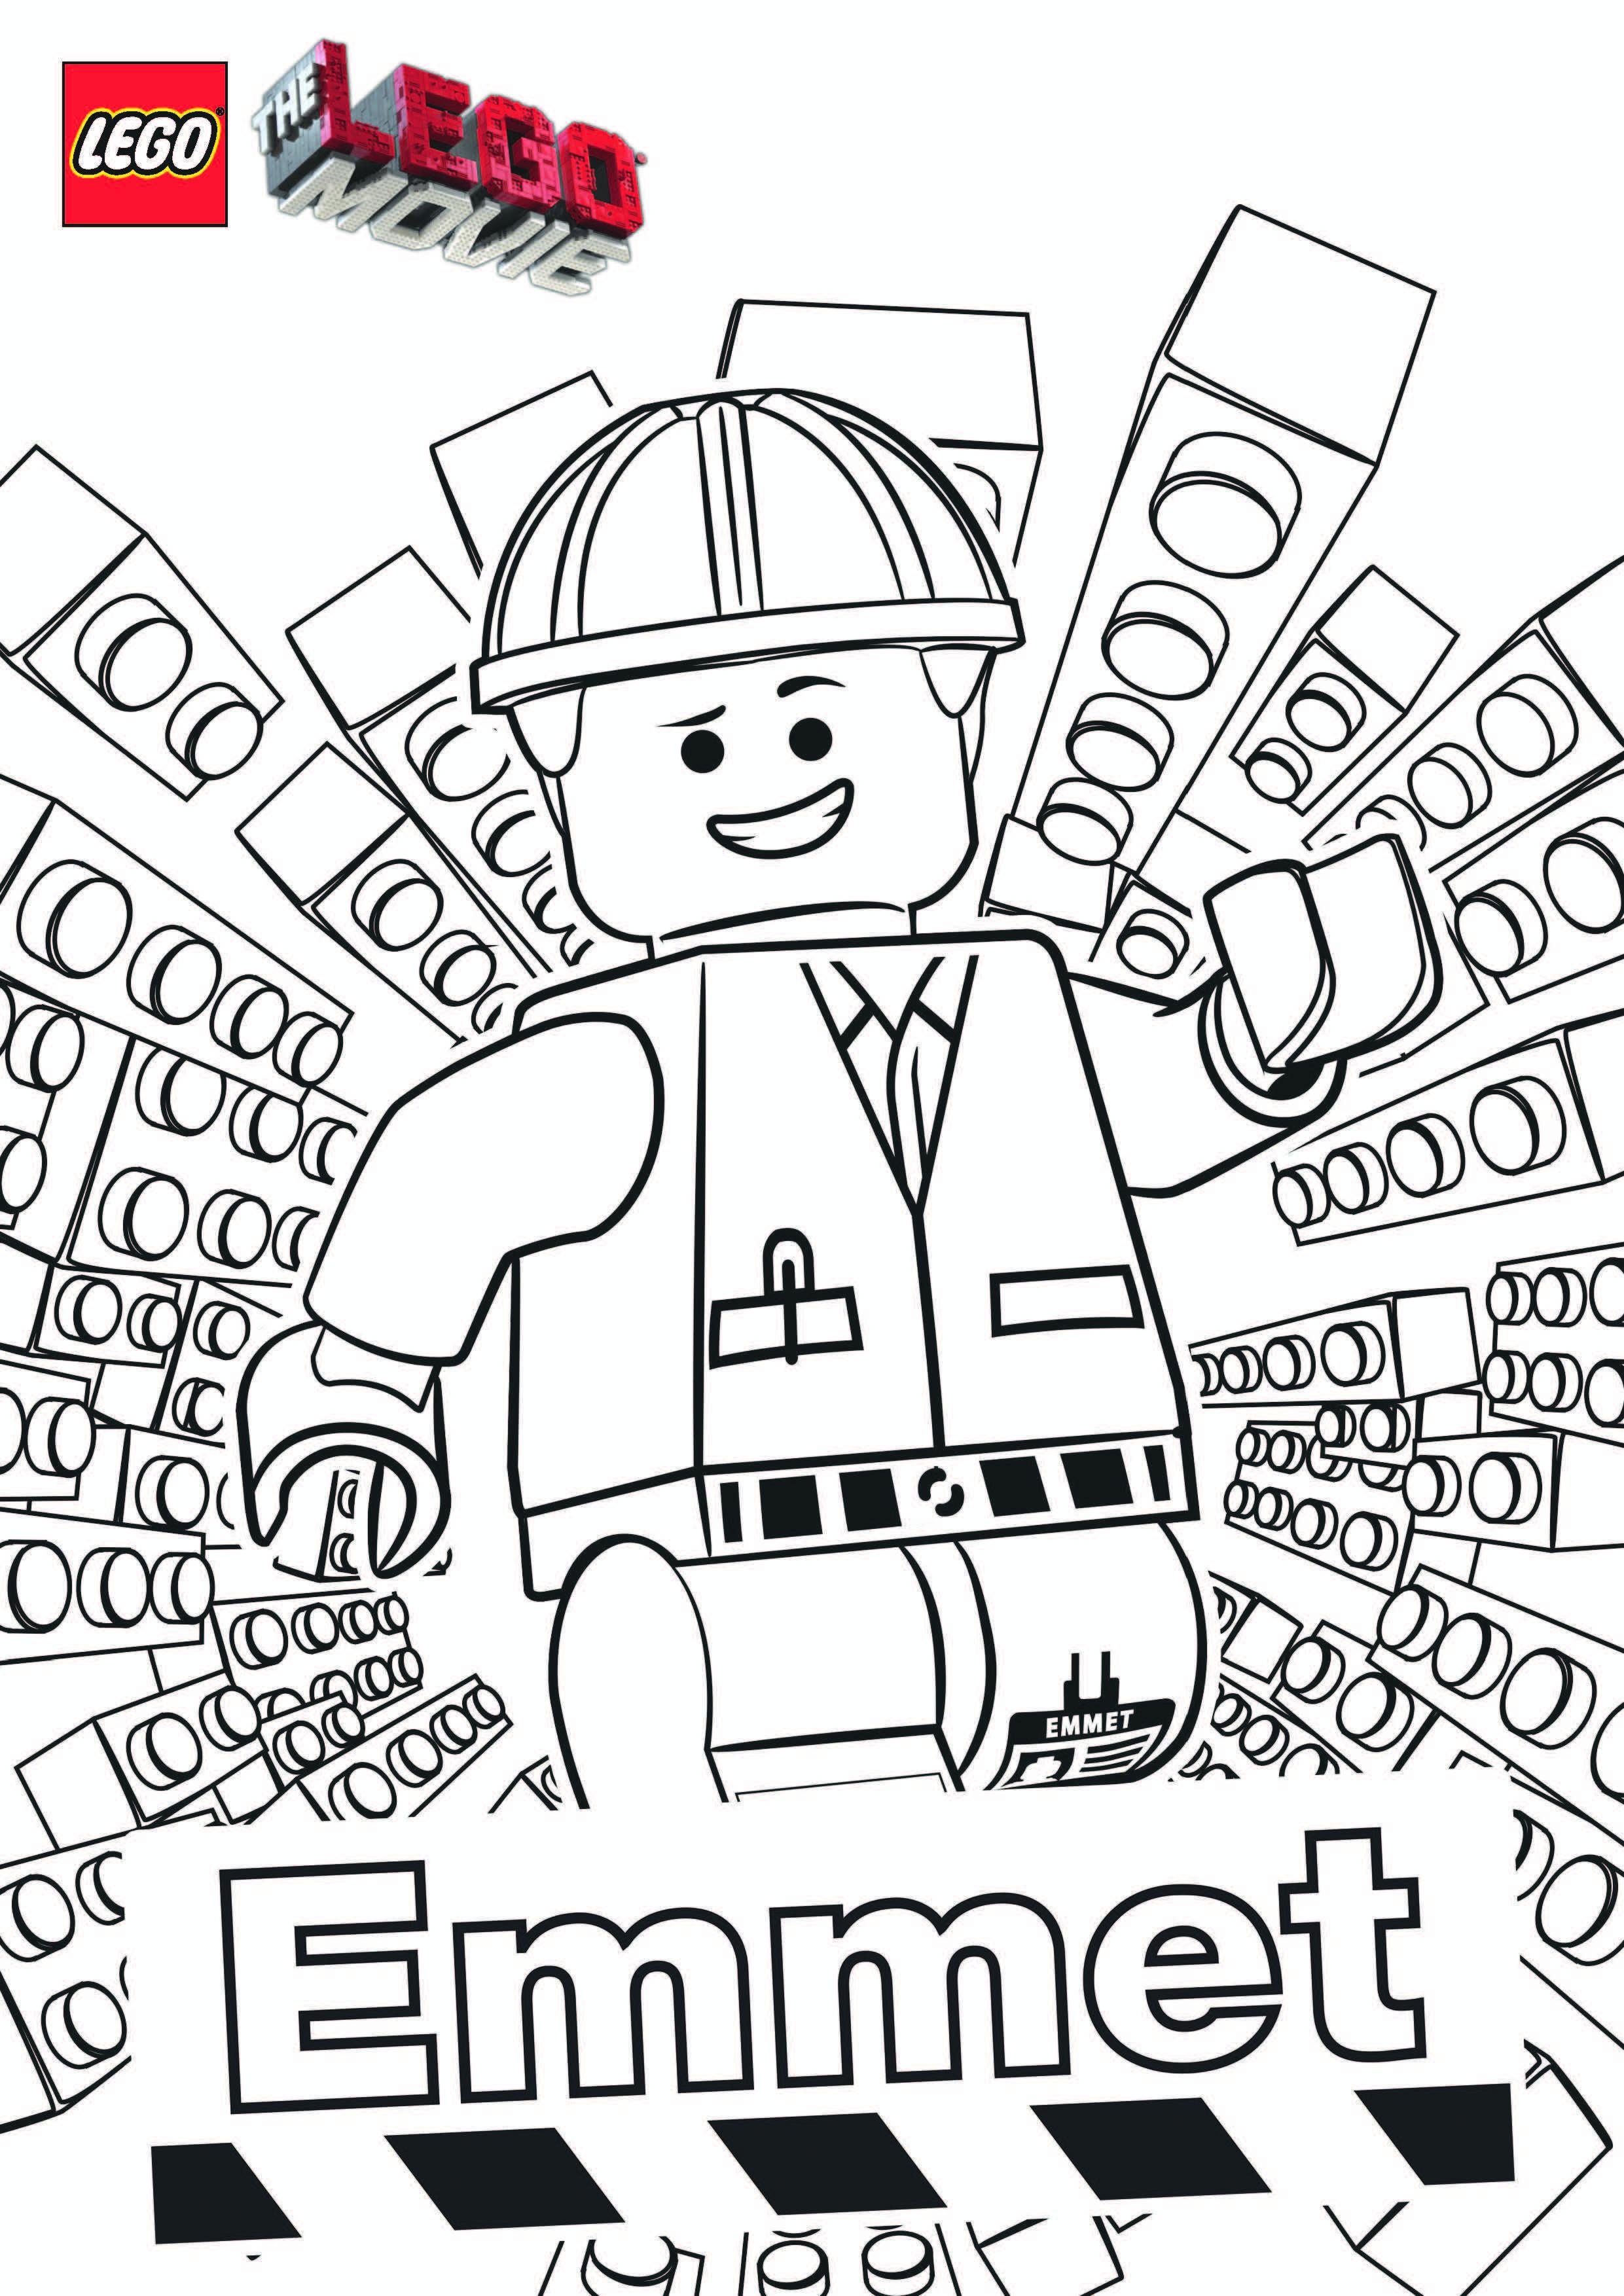 Bonito Libro De Colorear De Película De Lego Friso - Dibujos Para ...